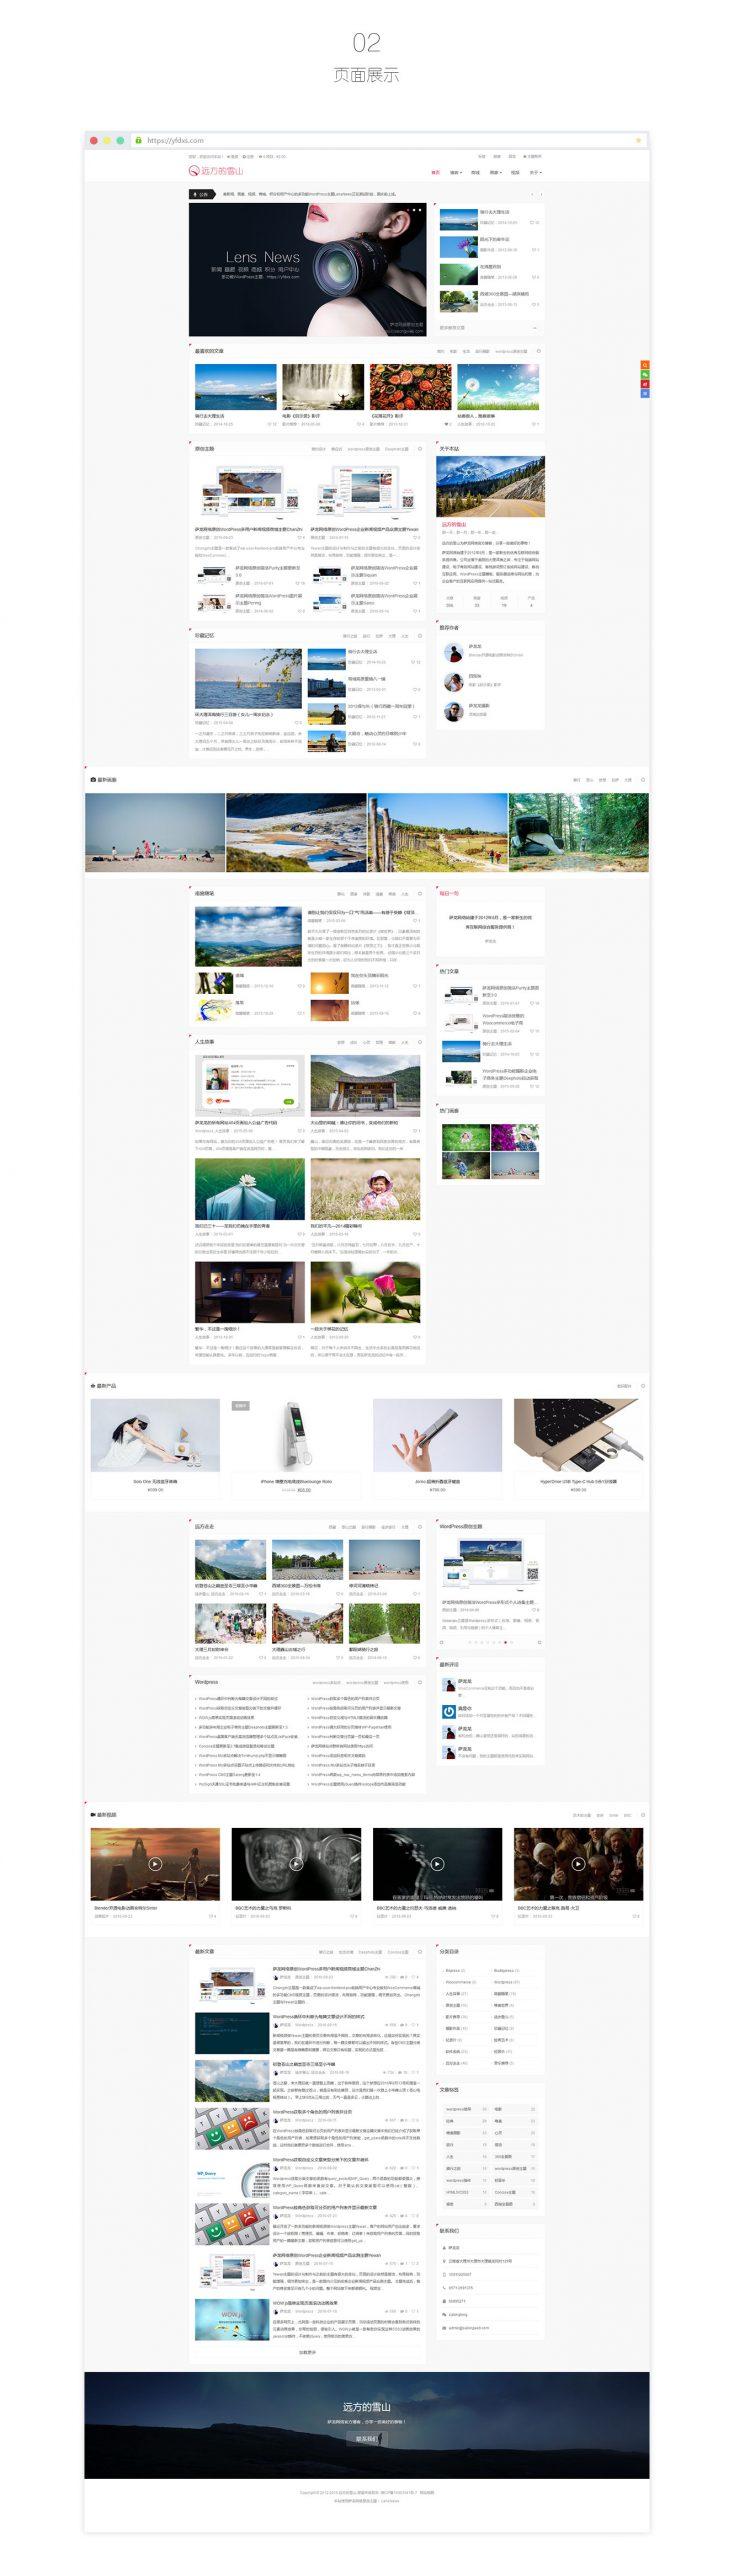 WordPress主题 LensNewsV3.0多功能新闻积分商城主题 去授权无限制版本